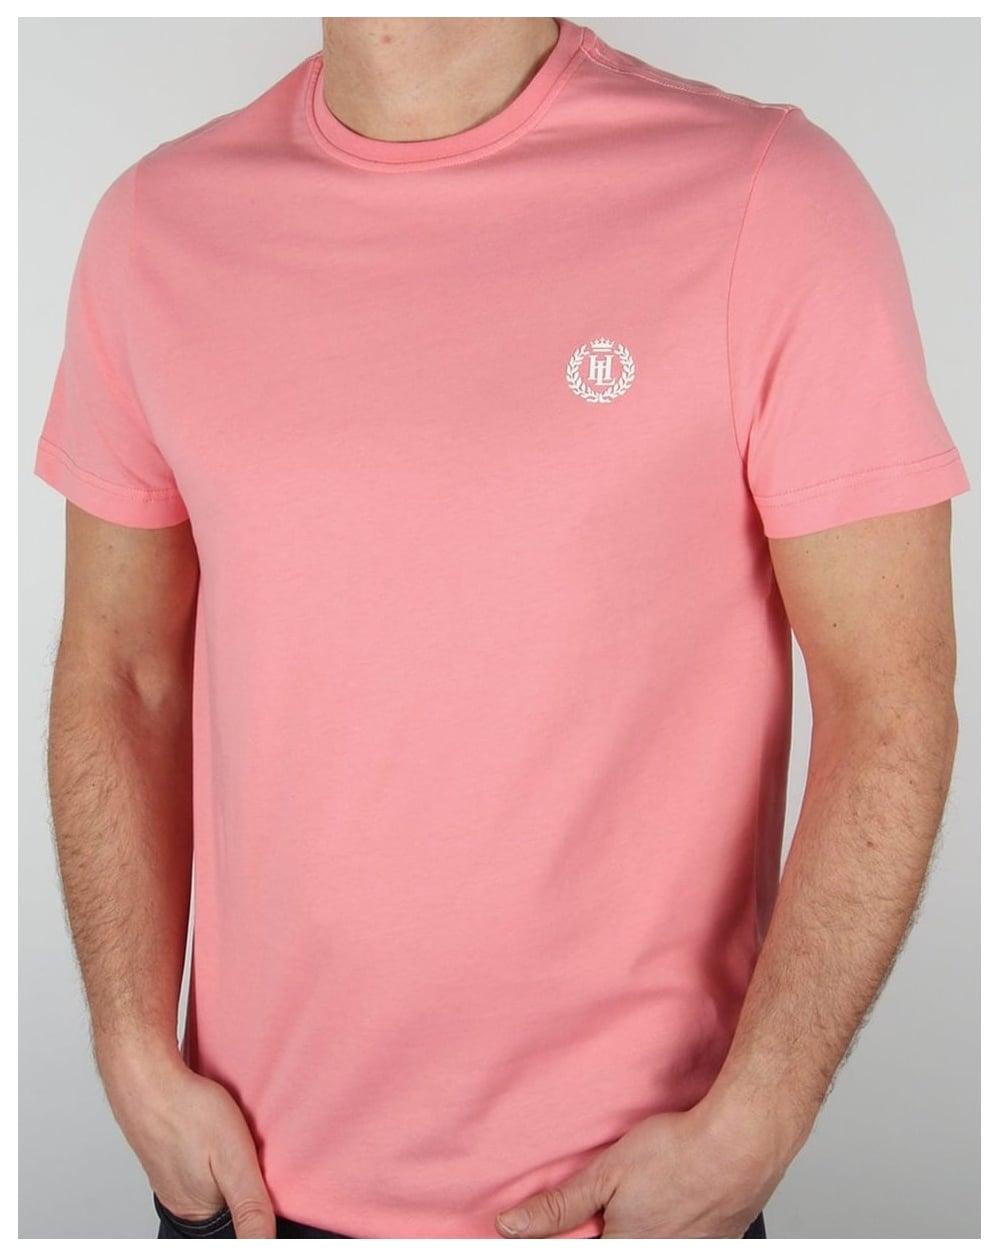 e757f537 Henri Lloyd Radar T Shirt Salmon Pink,tee,logo,mens,sale